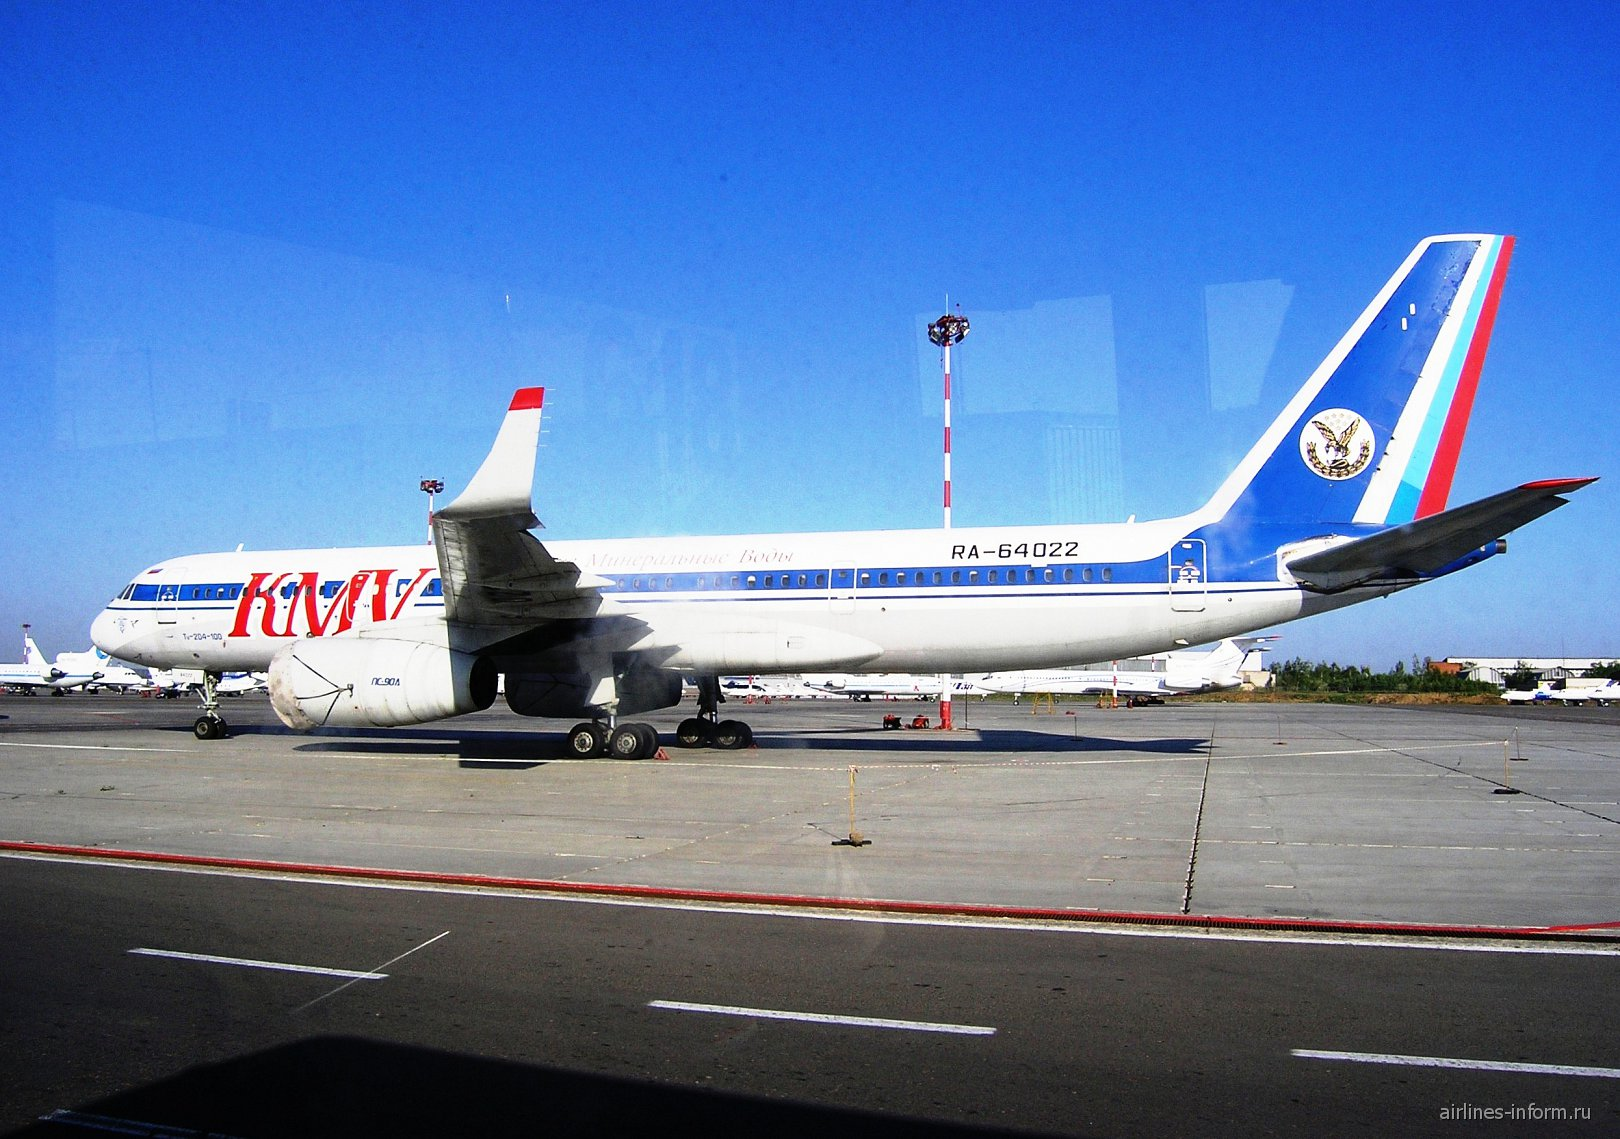 Самолет Ту-204 RA-64022 авиакомпании Кавминводыавиа